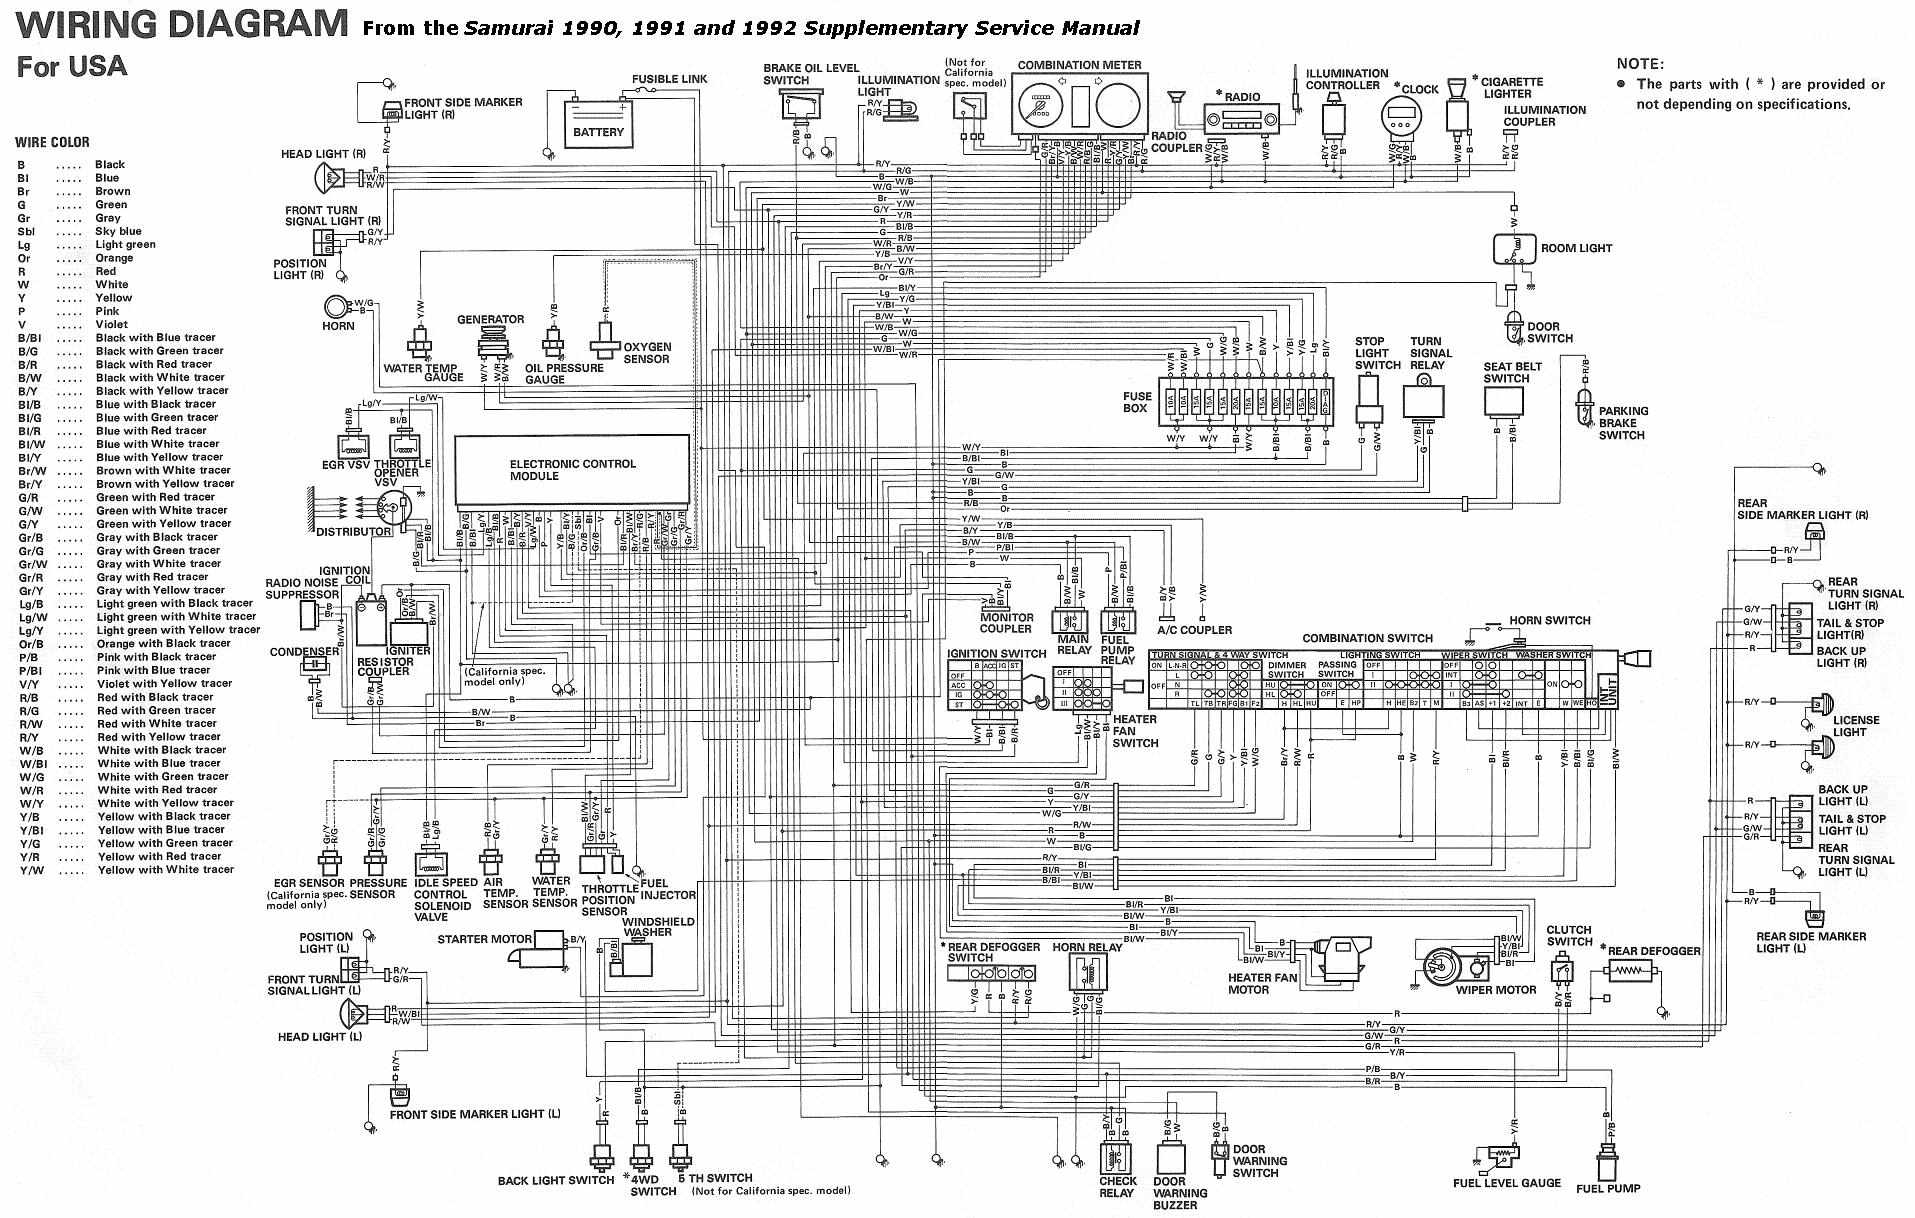 SUZUKI - Car PDF Manual, Wiring Diagram & Fault Codes DTCautomotive-manuals.net